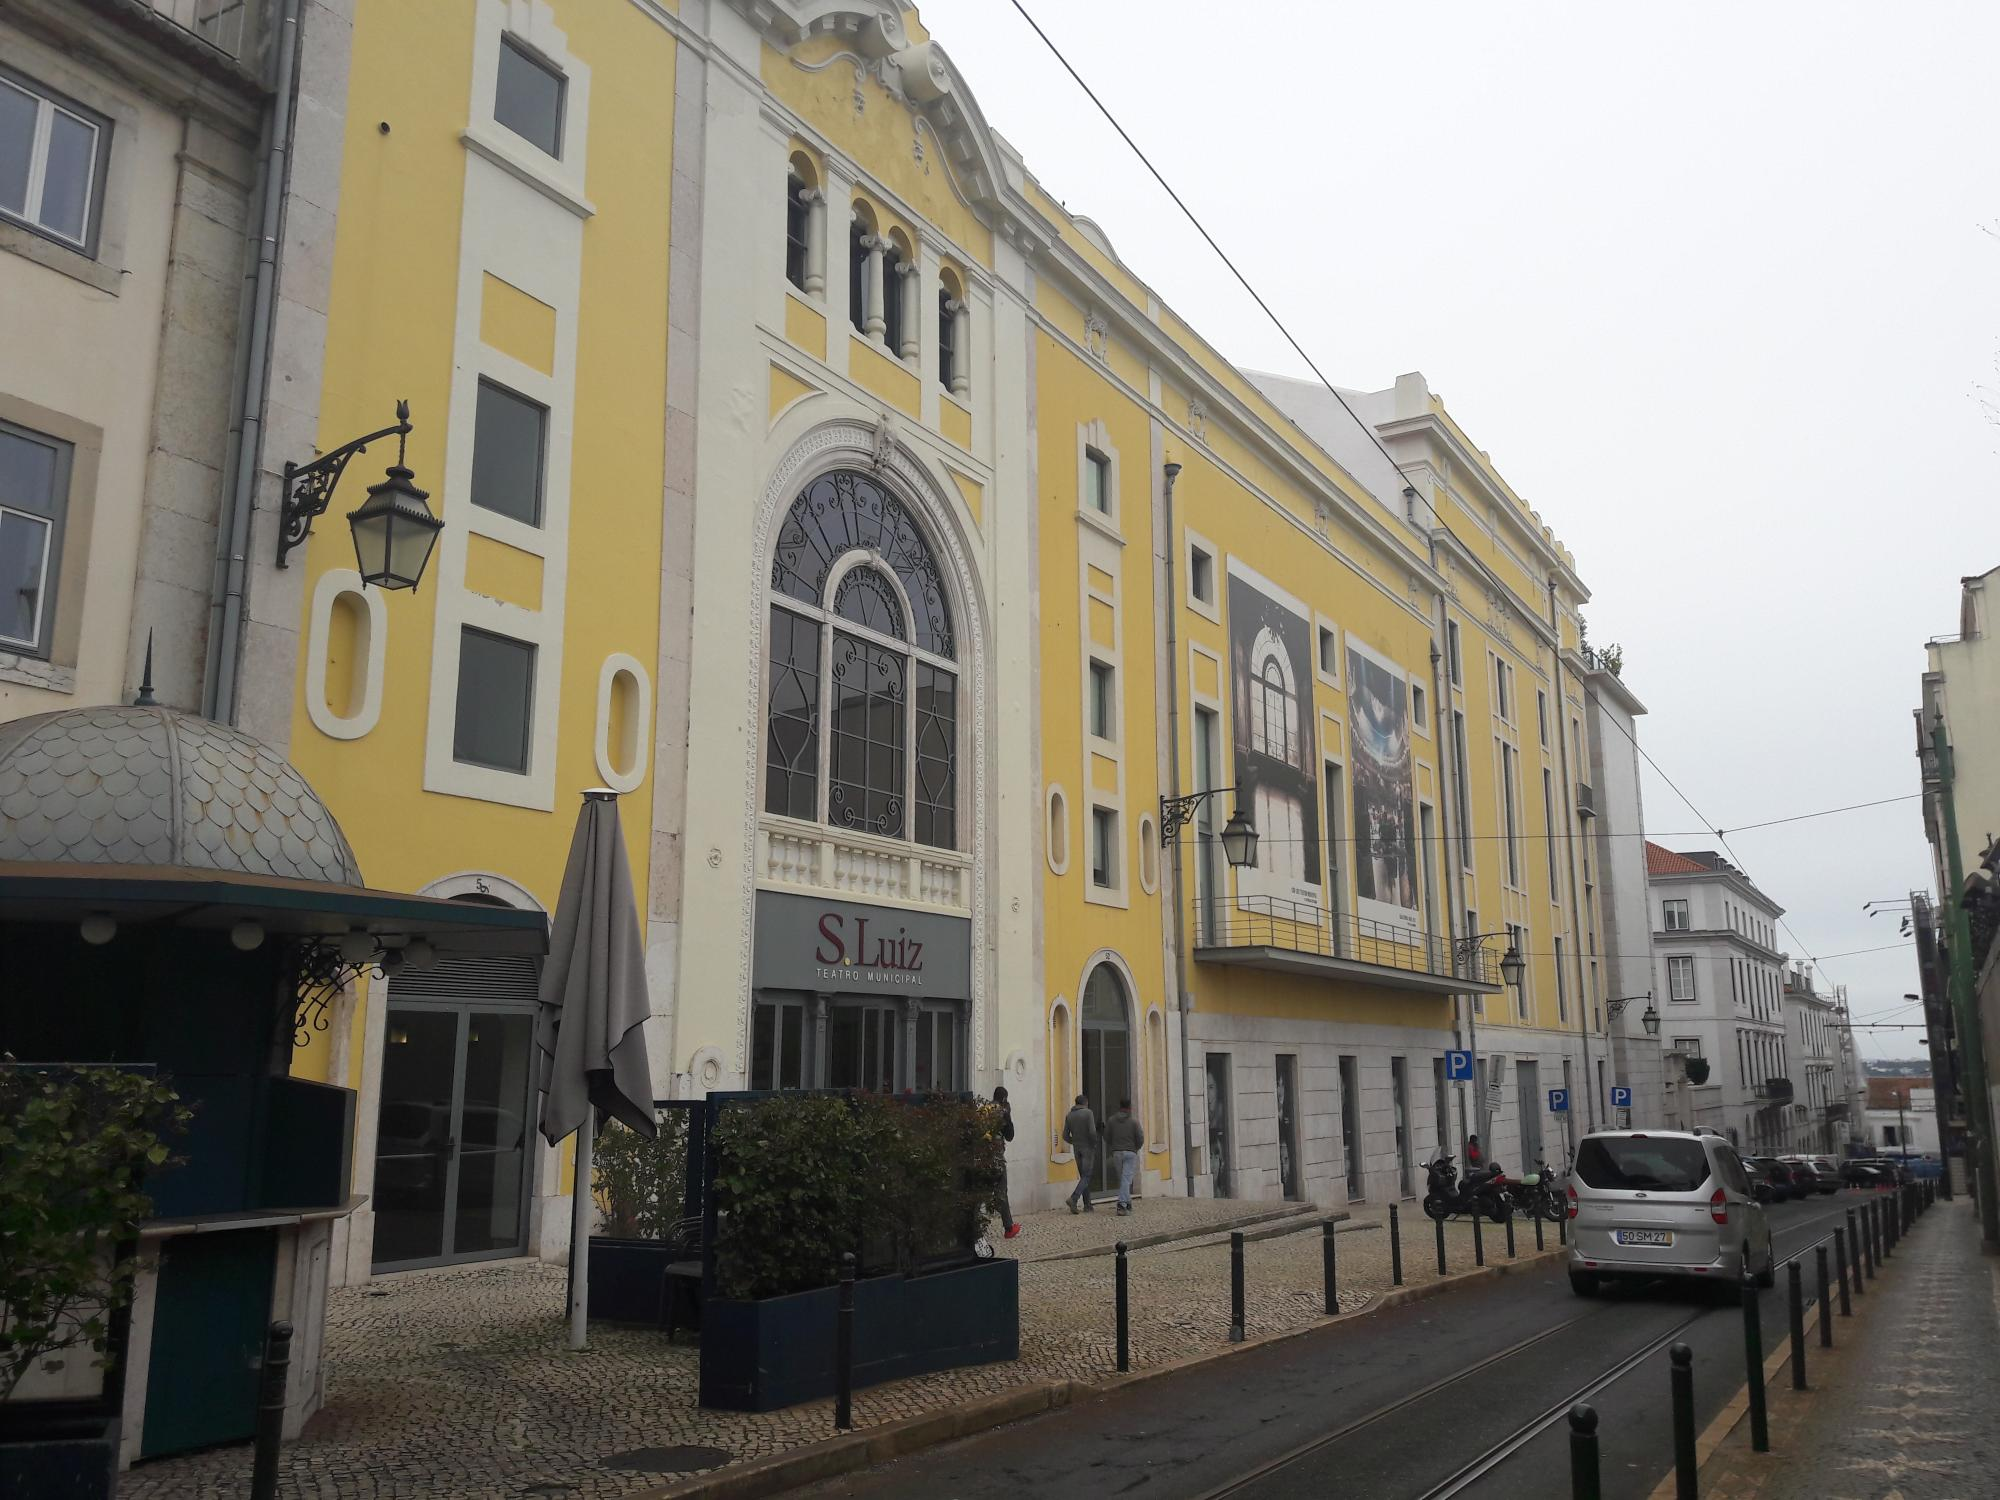 SÃO LUIZ MUNICIPAL THEATRE 9 Hotel Mercy